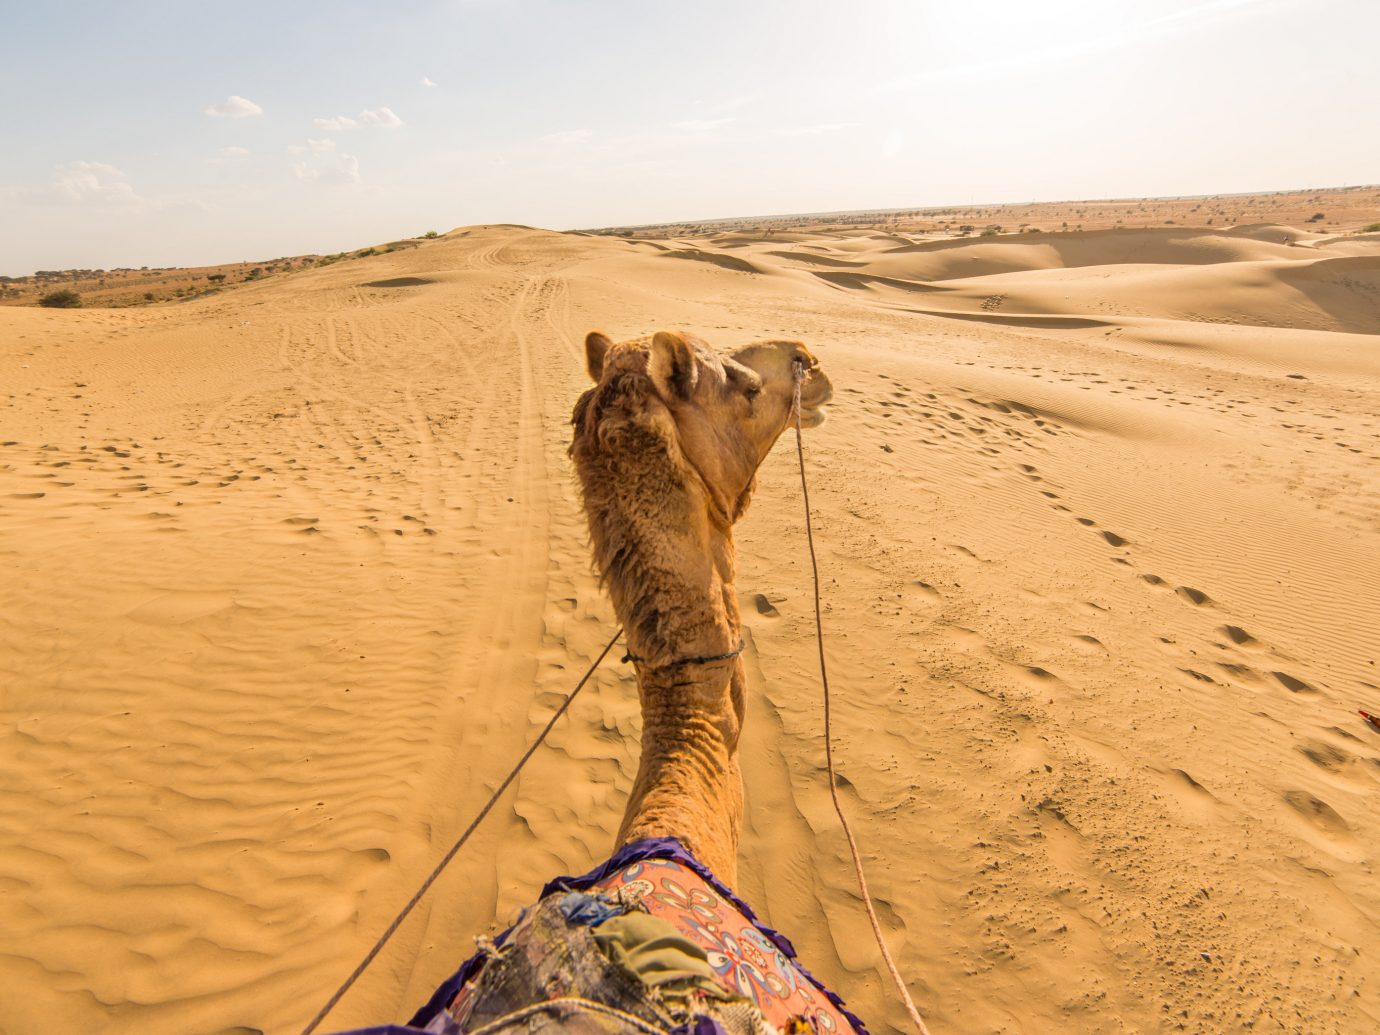 India Jaipur Jodhpur Trip Ideas Desert erg sahara sand aeolian landform landscape singing sand dune arabian camel ecoregion Camel sky vacation wadi camel like mammal